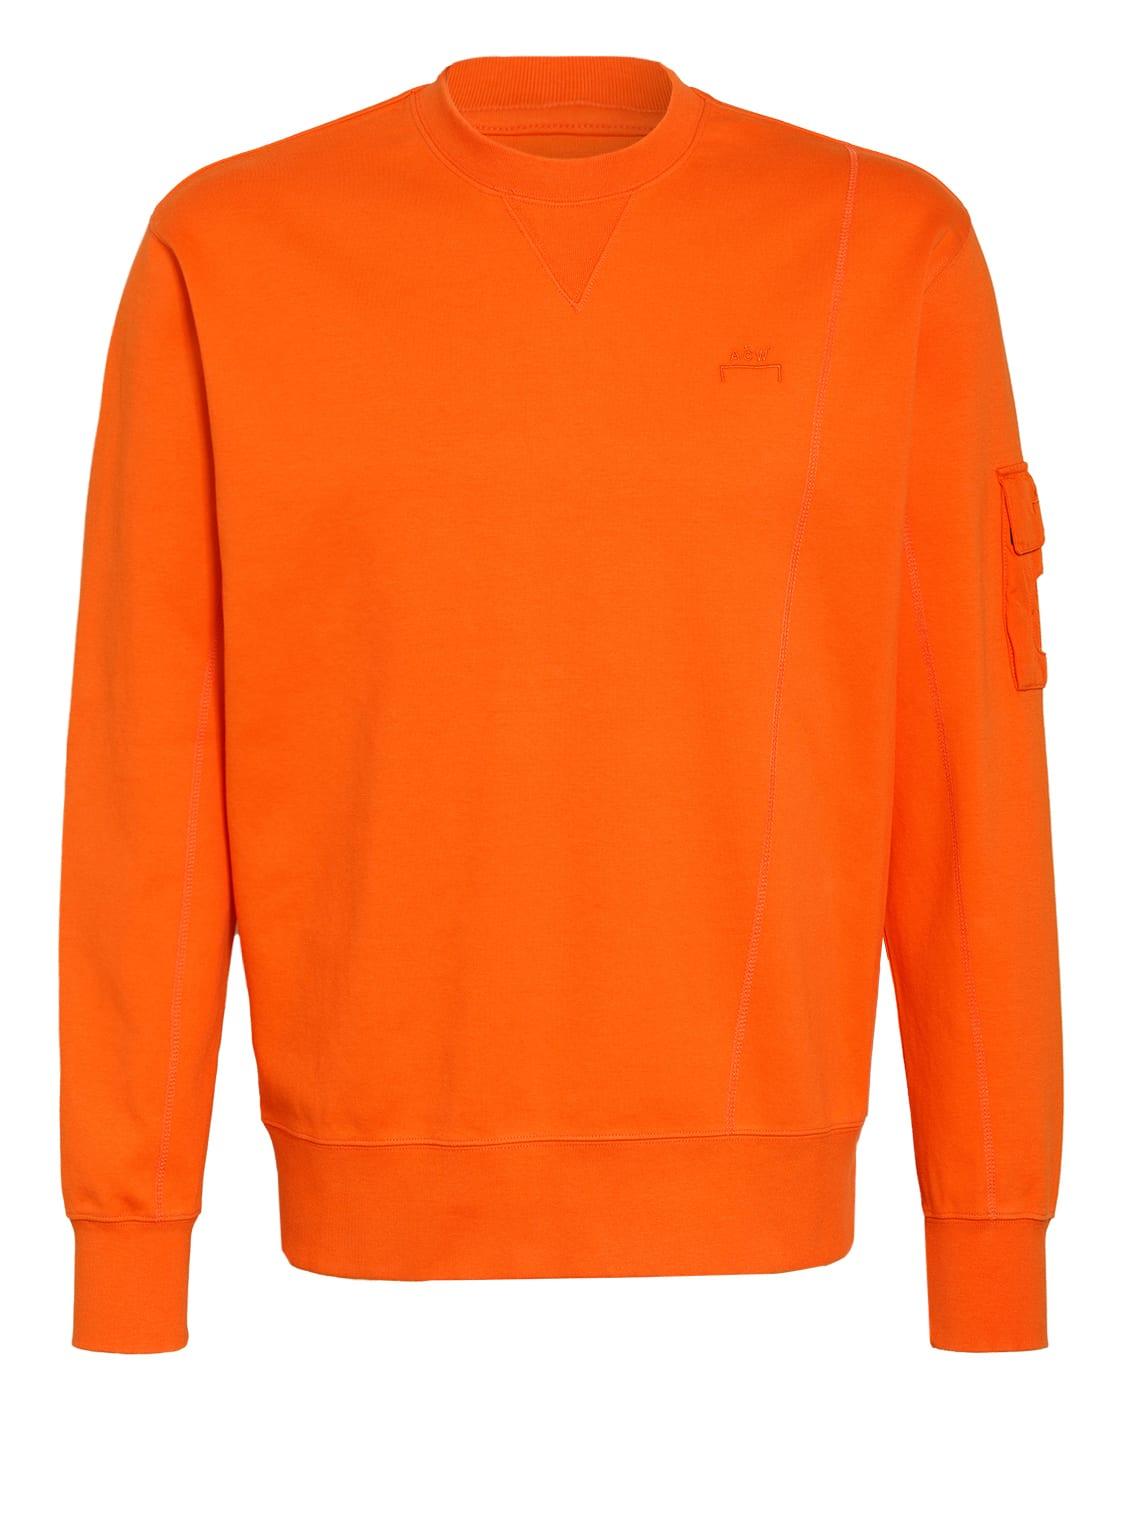 Image of A-Cold-Wall* Sweatshirt orange